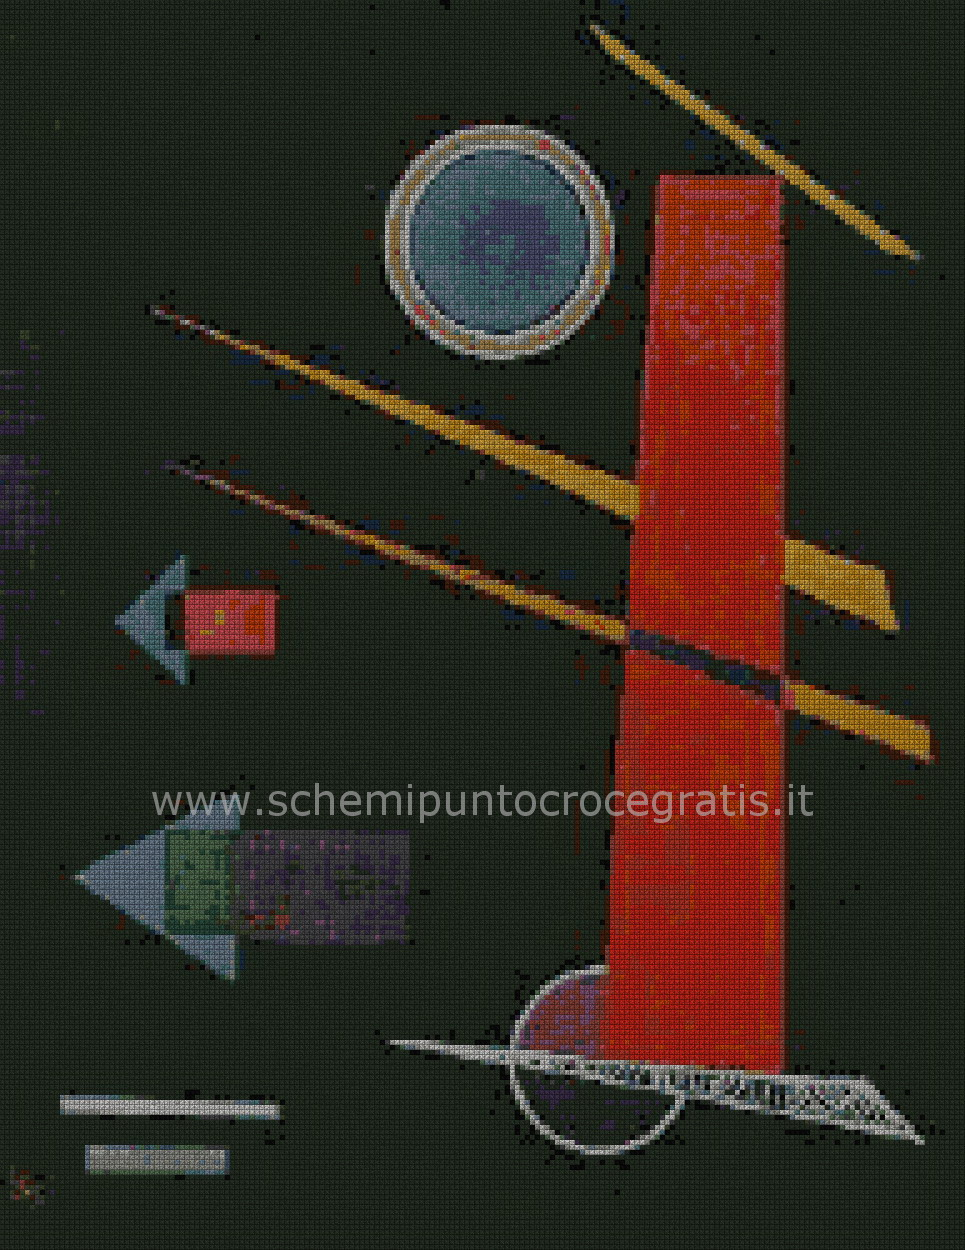 pittori_moderni/kandinsky/kandinsky13.jpg